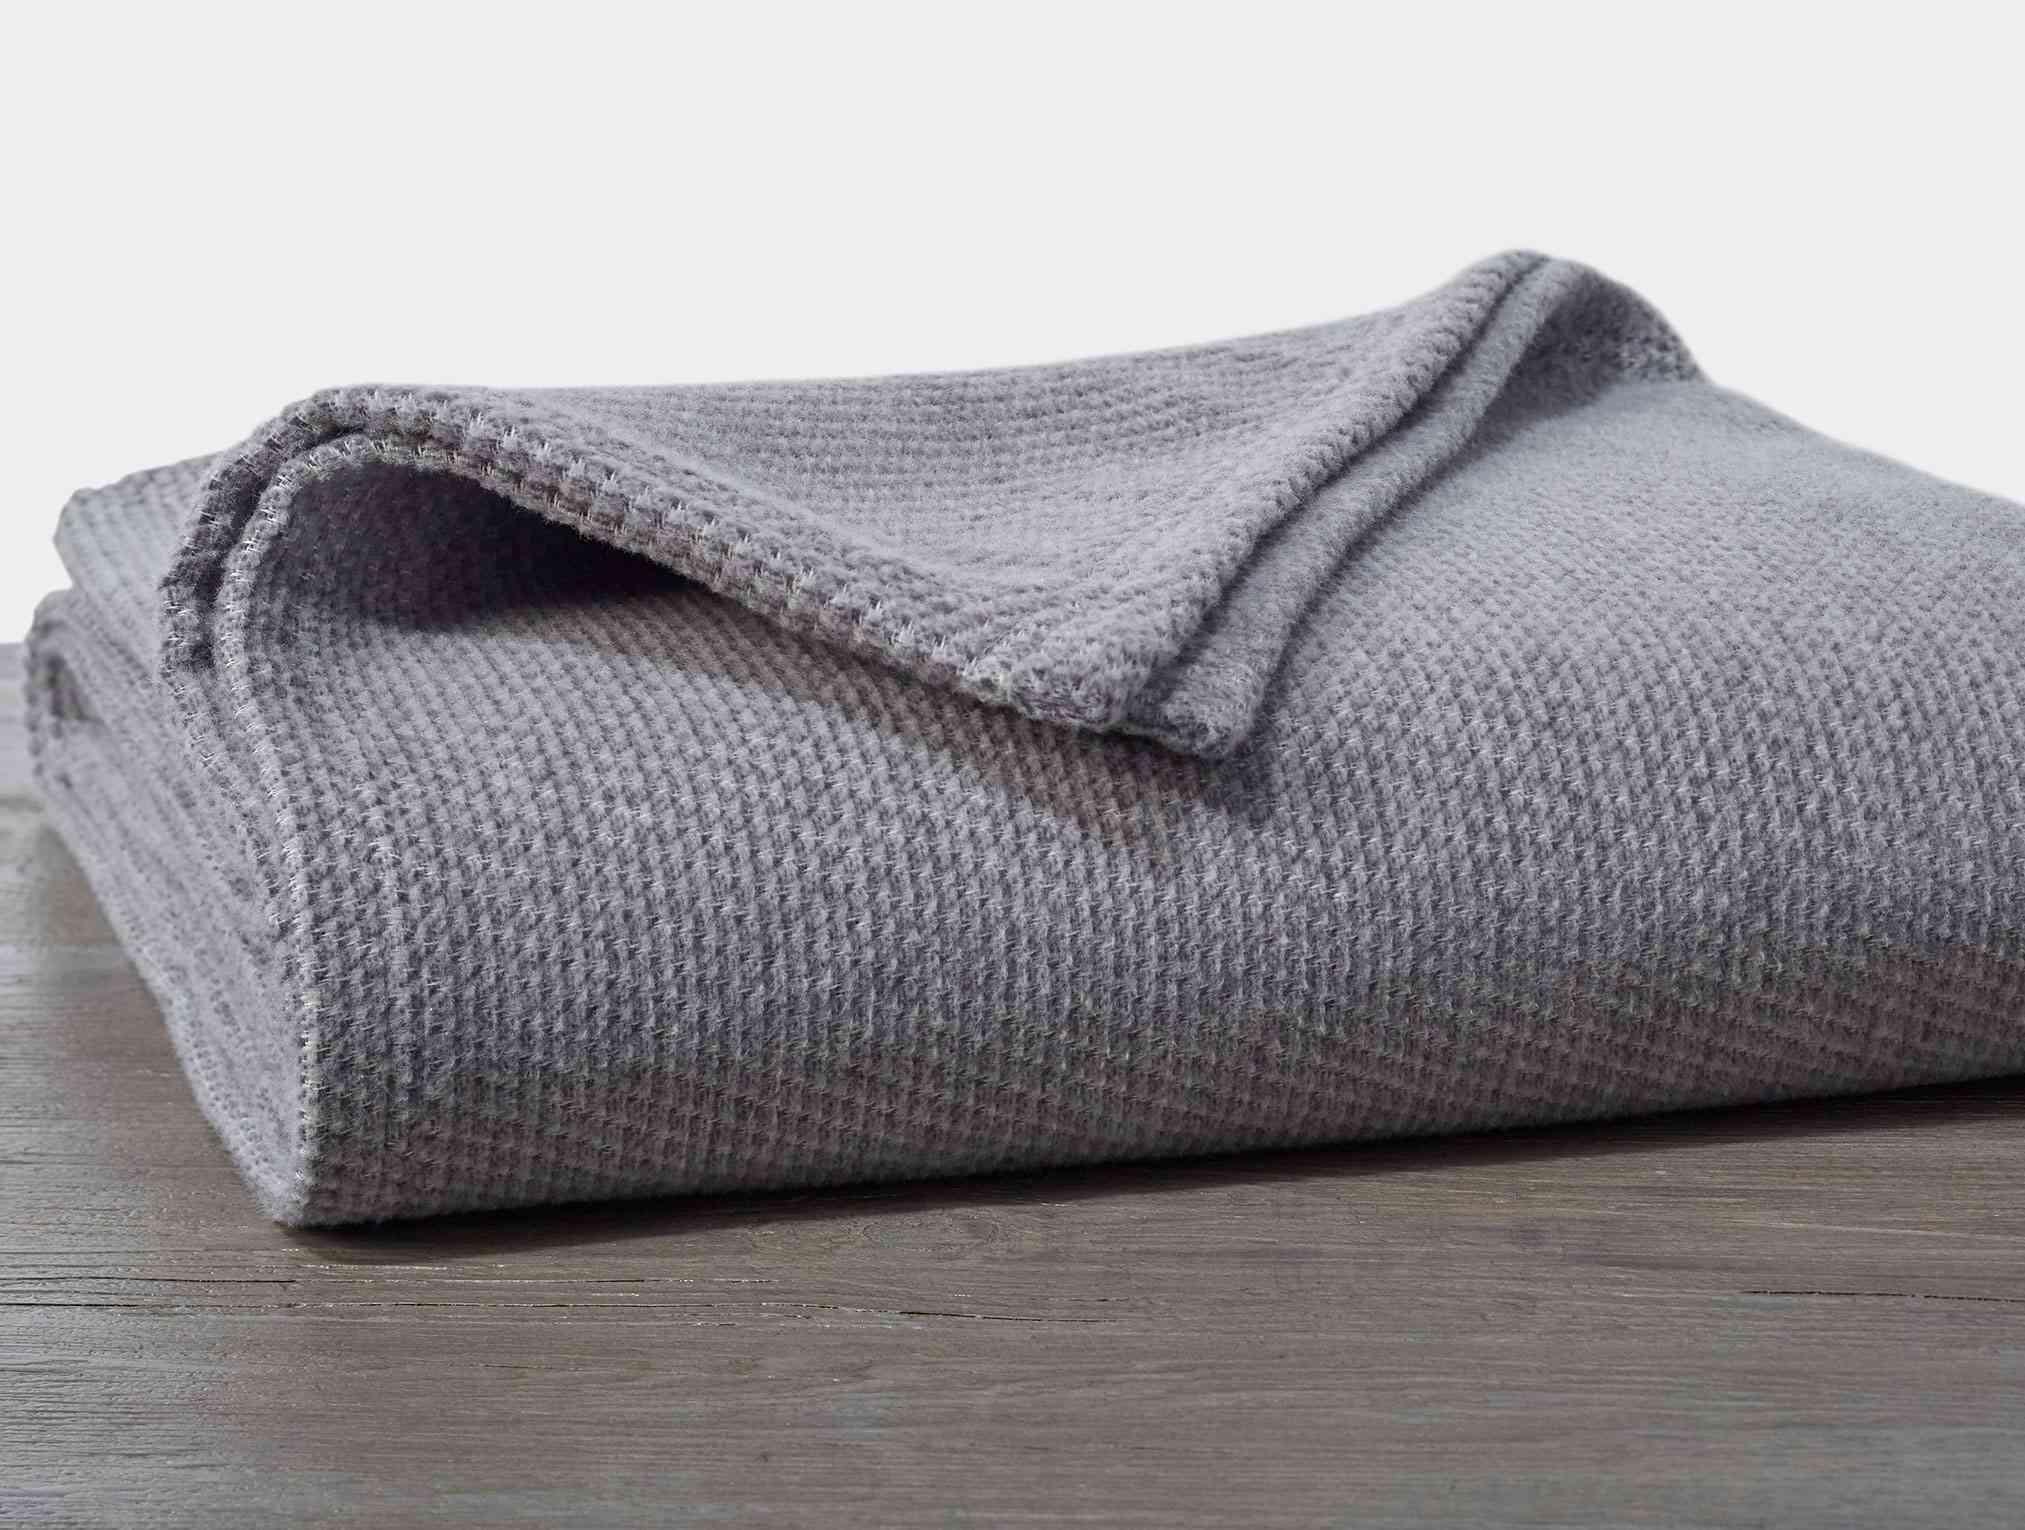 A folded gray cotton-wool blend blanket.